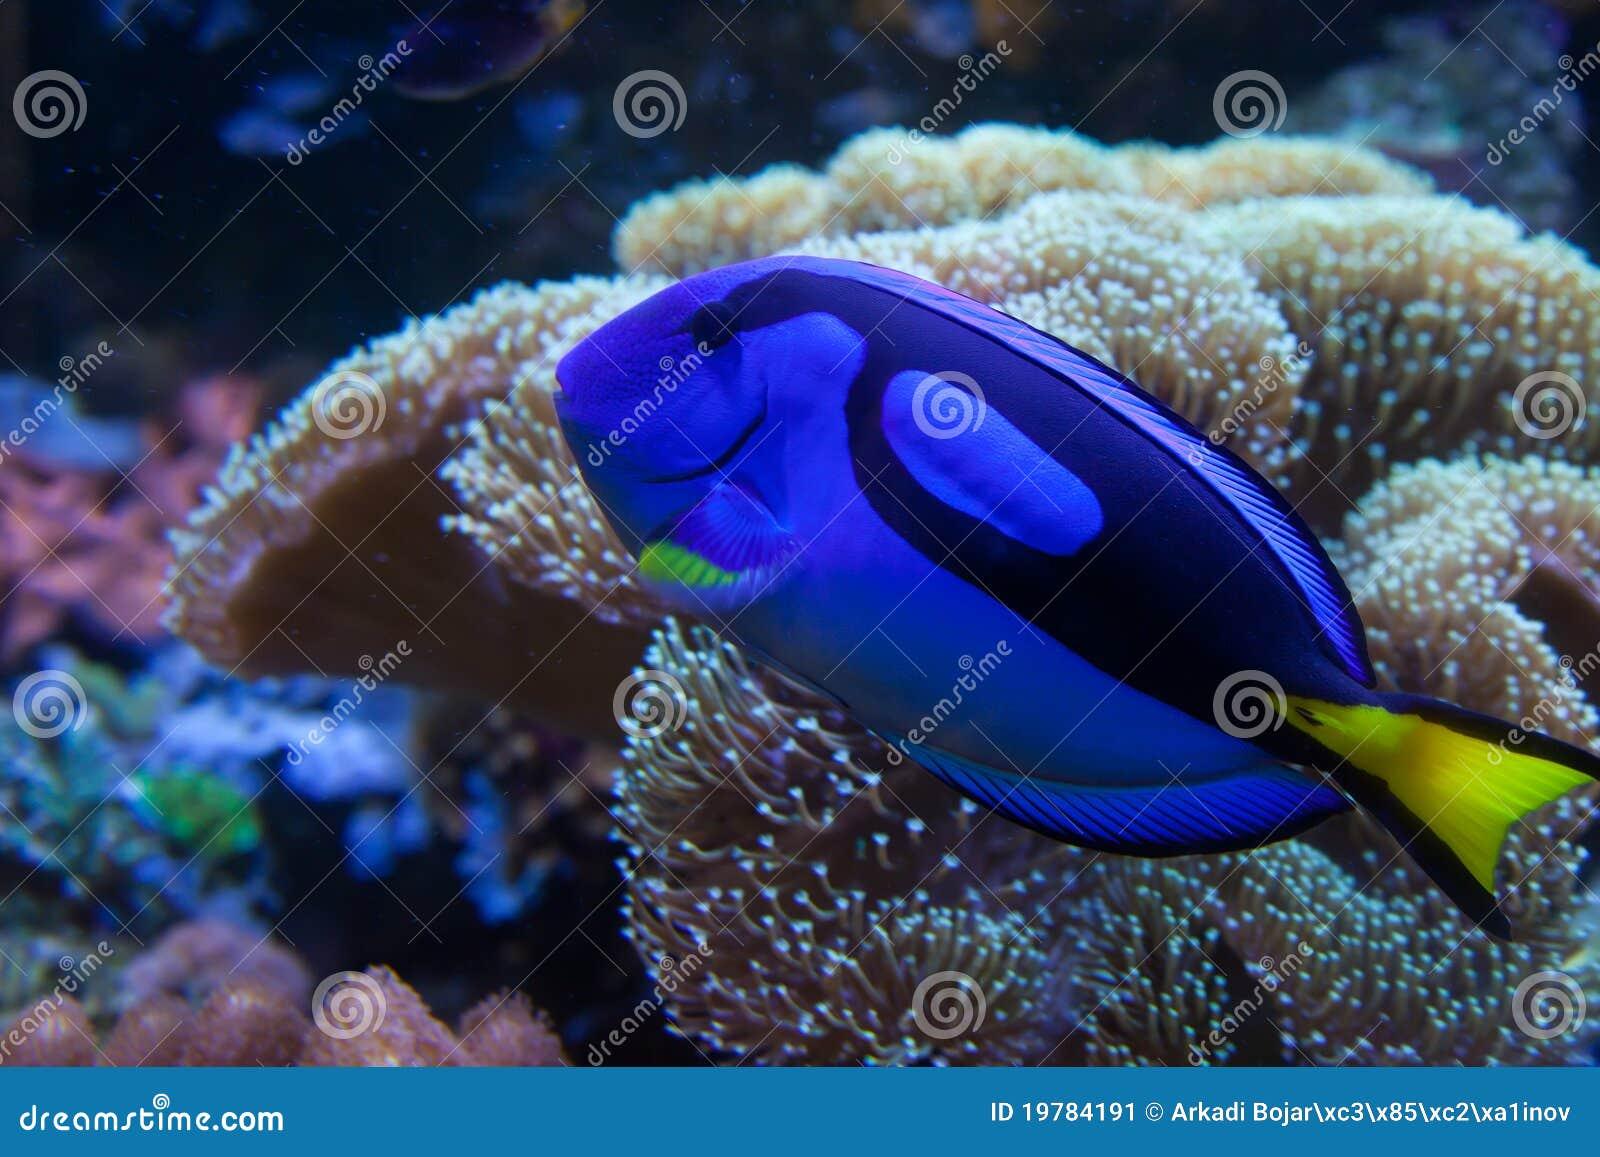 poissons exotiques d 39 aquarium image stock image 19784191. Black Bedroom Furniture Sets. Home Design Ideas